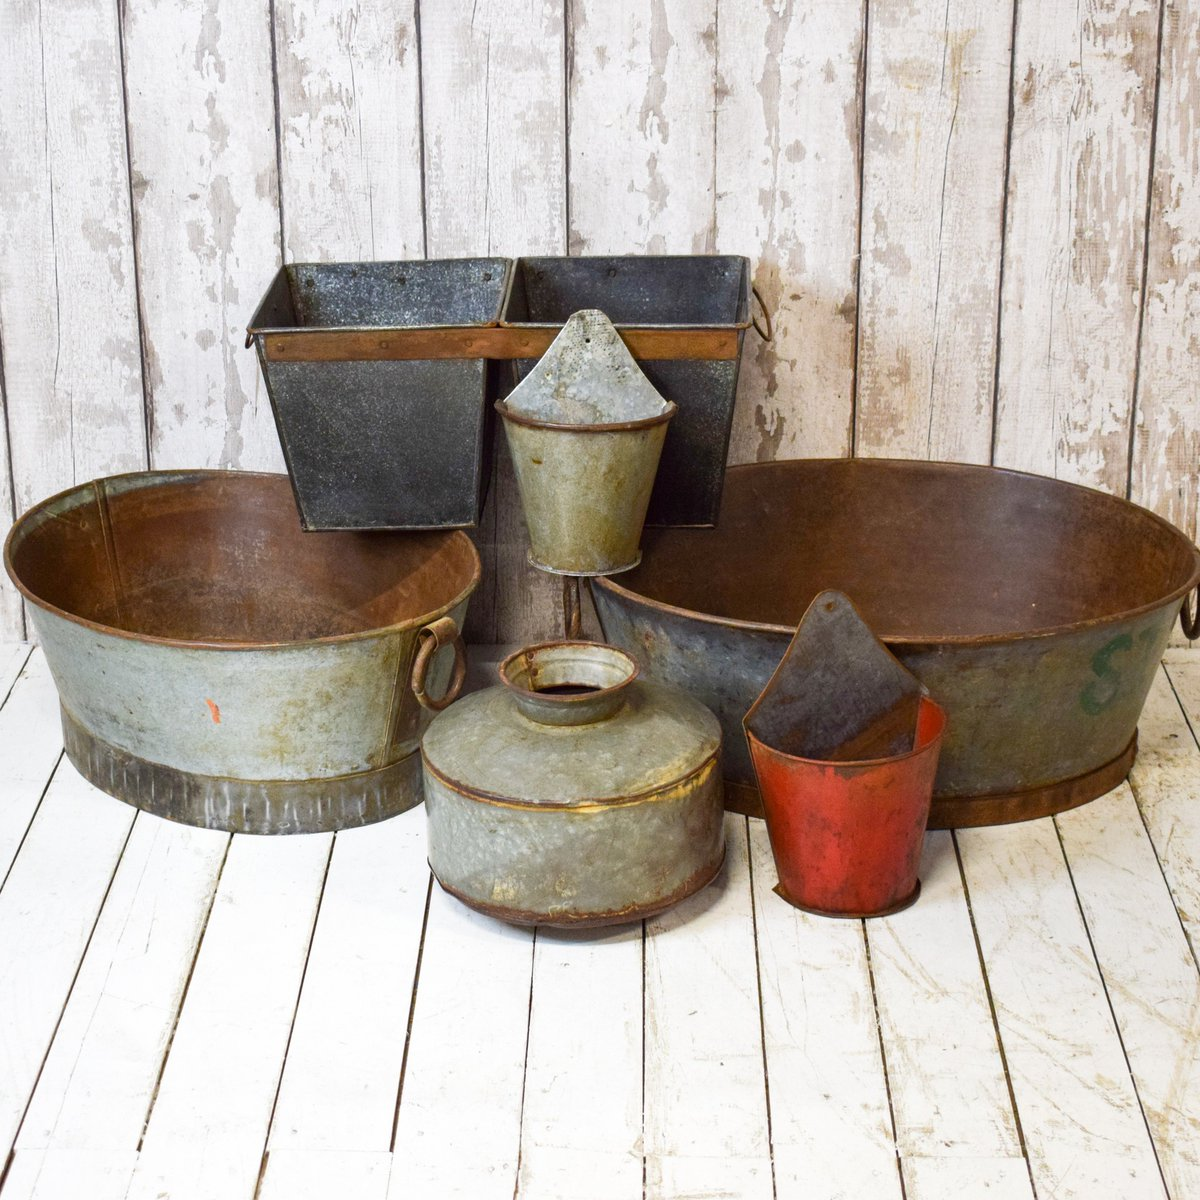 P L A N T E R S.  Lots in stock. New stock still being added to our website every day! #millwards #vintage #antique #antiquedealersofinstagram